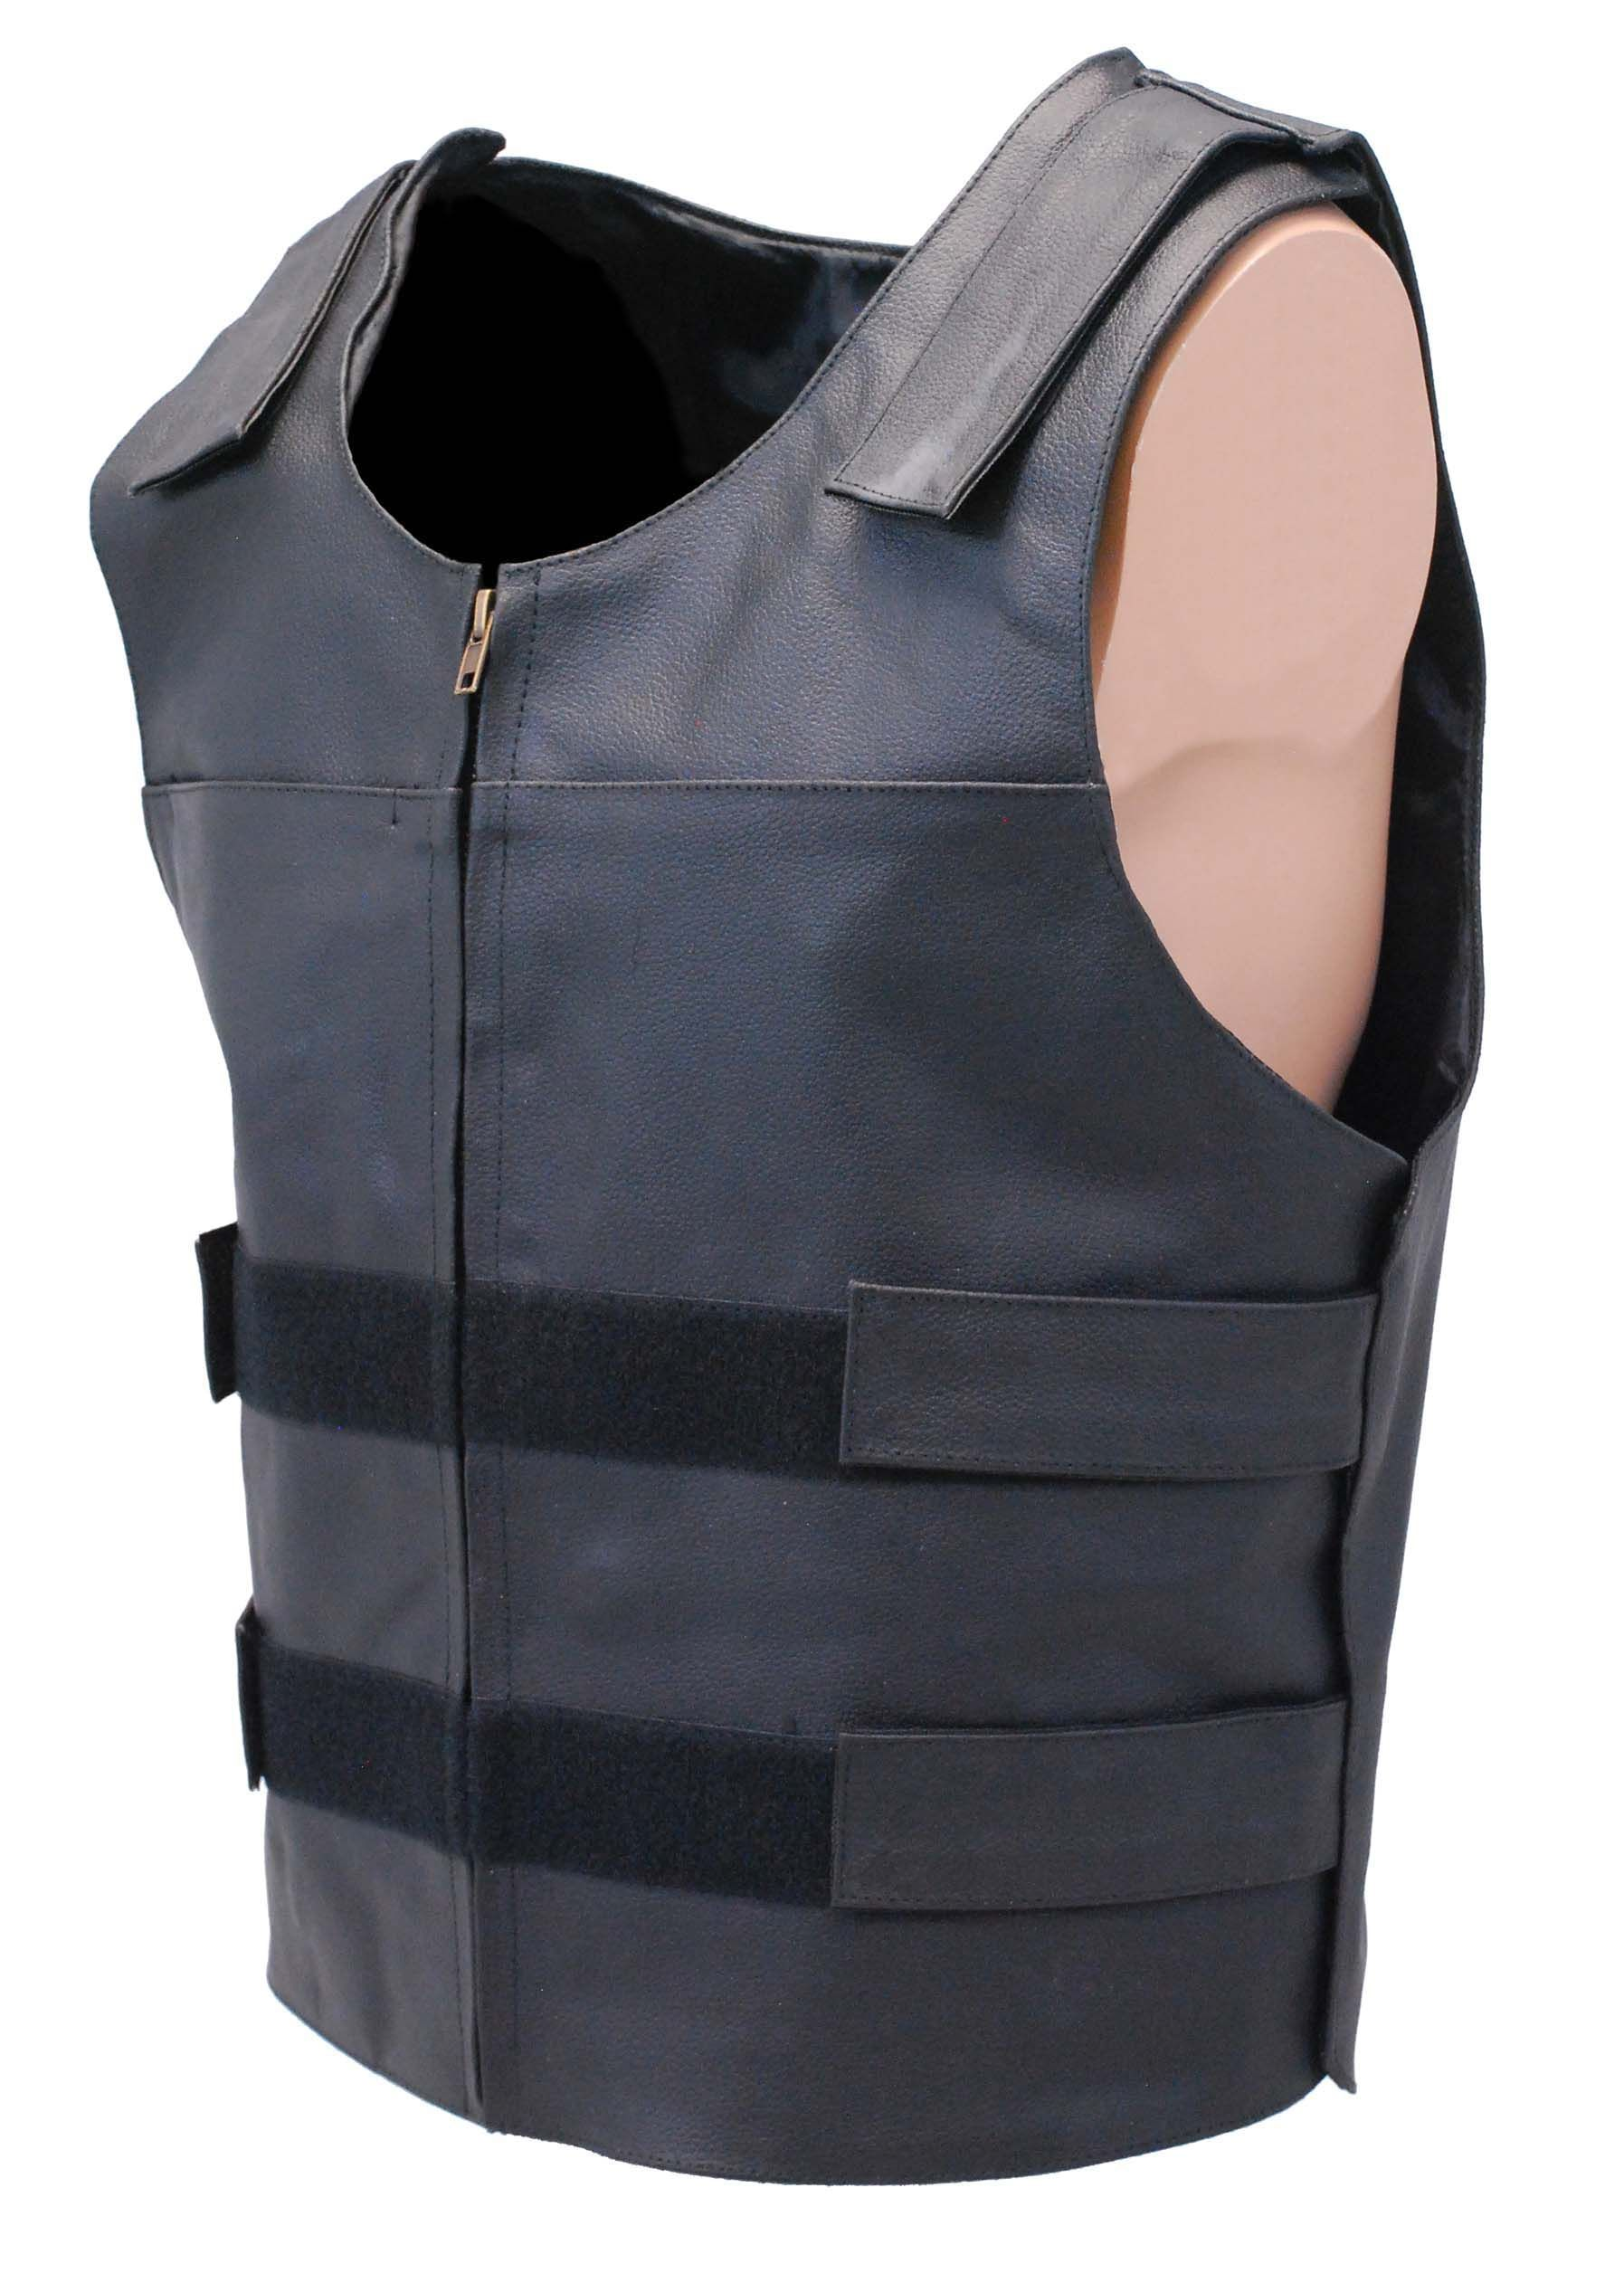 Black Police Safety Vest w/Front Zipper VM945ZK (With